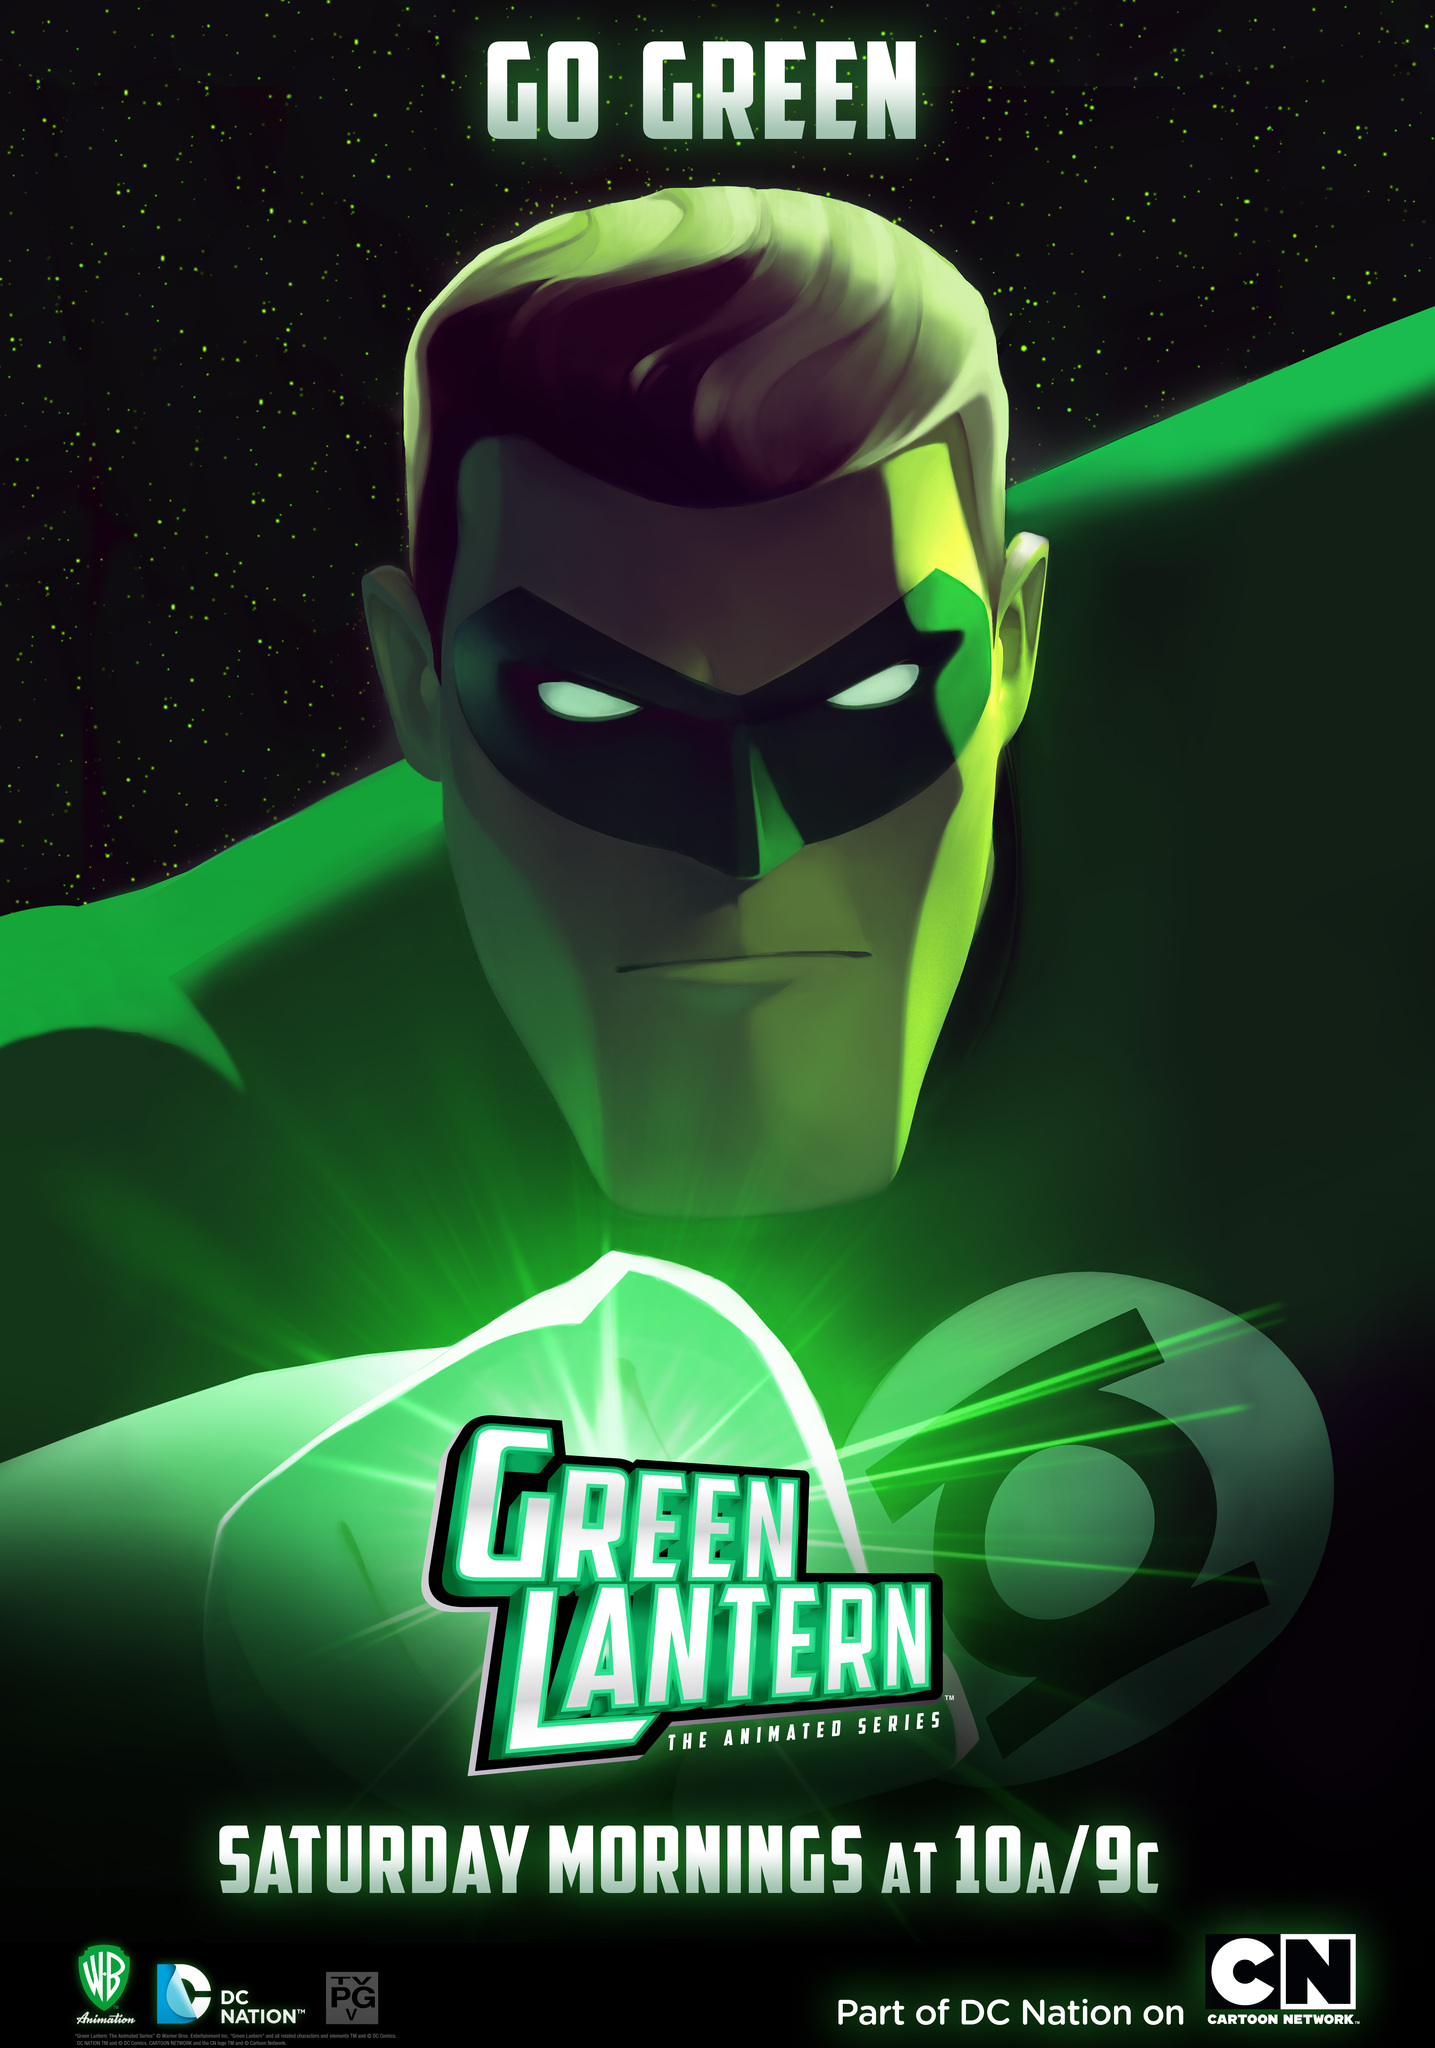 Green Lantern: The Animated Series (TV Series 2011–2013) - IMDb